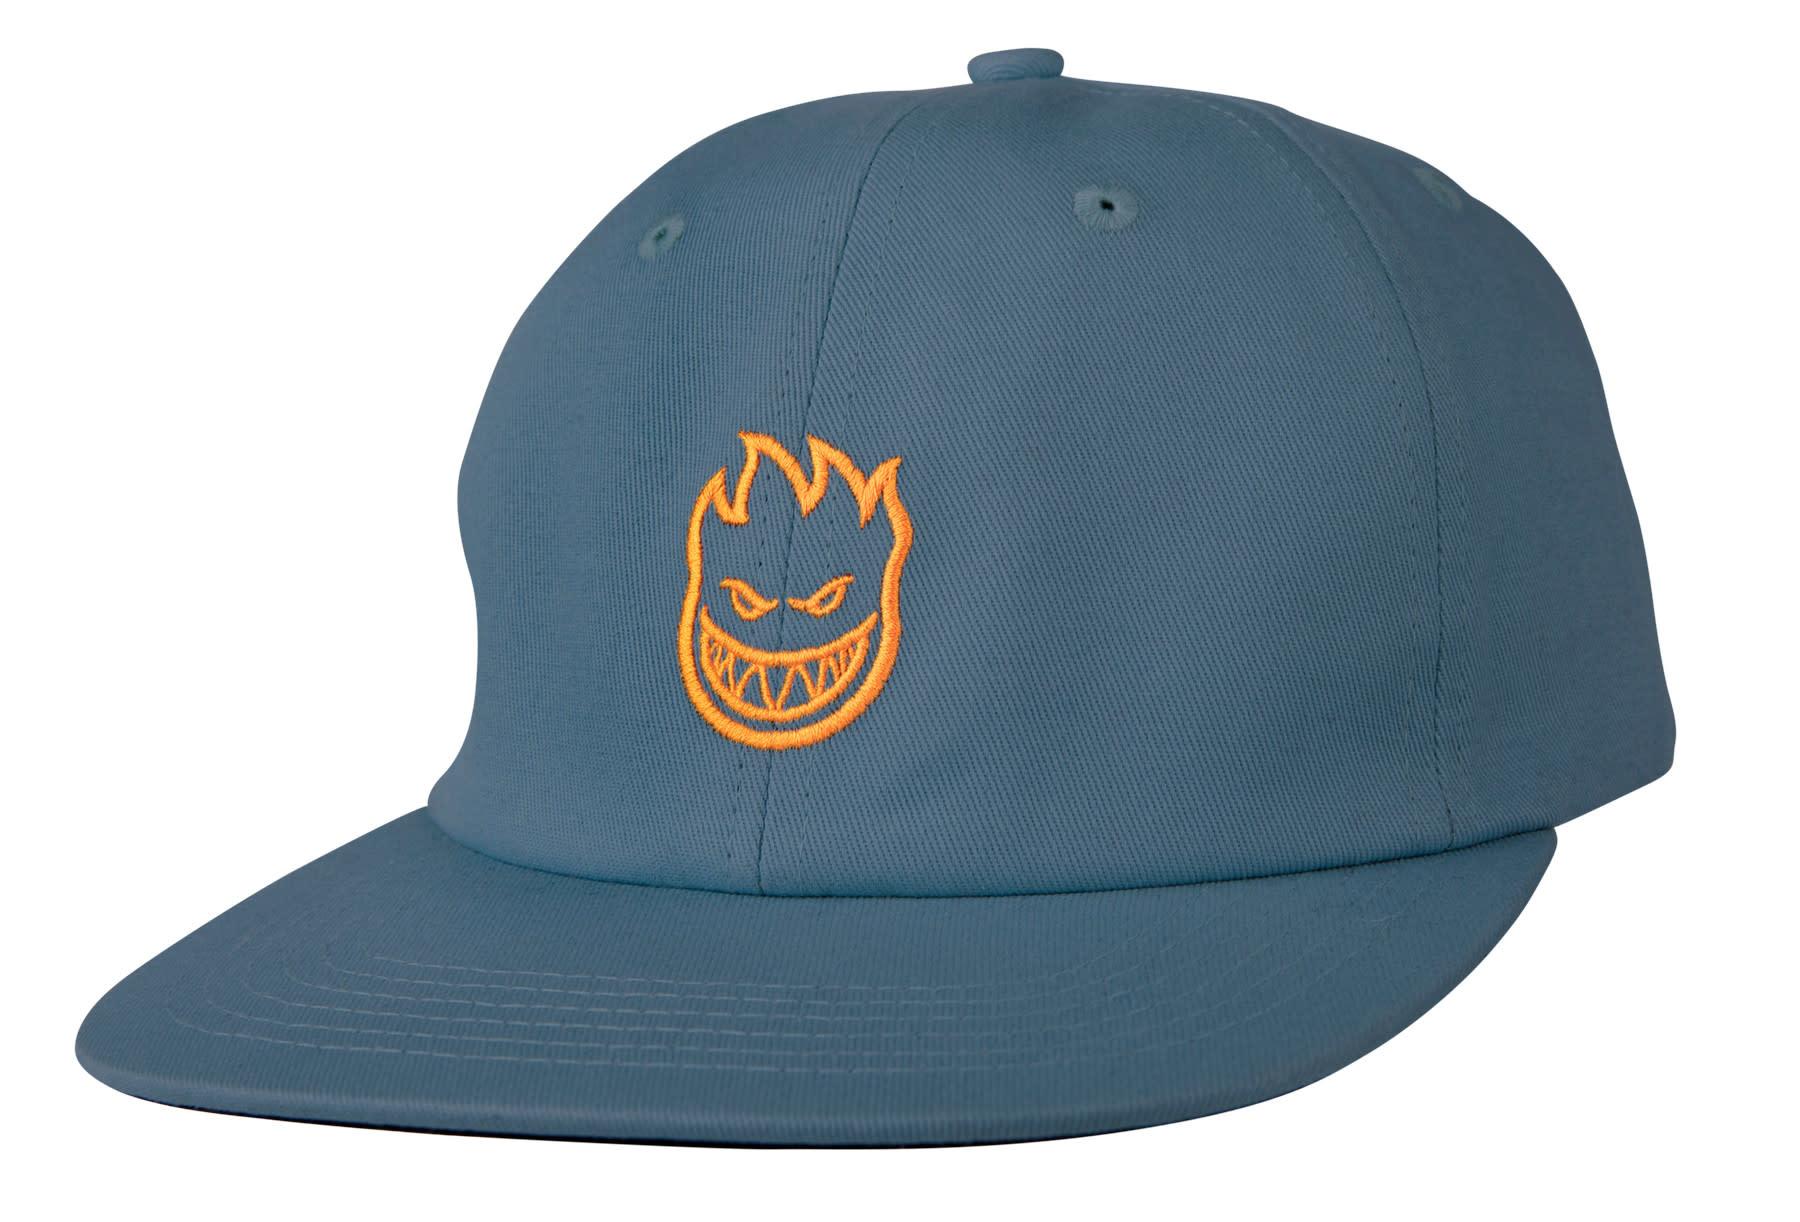 Spitfire Spitfire Classic Lil Bighead Strapback Hat - Blue/Orange